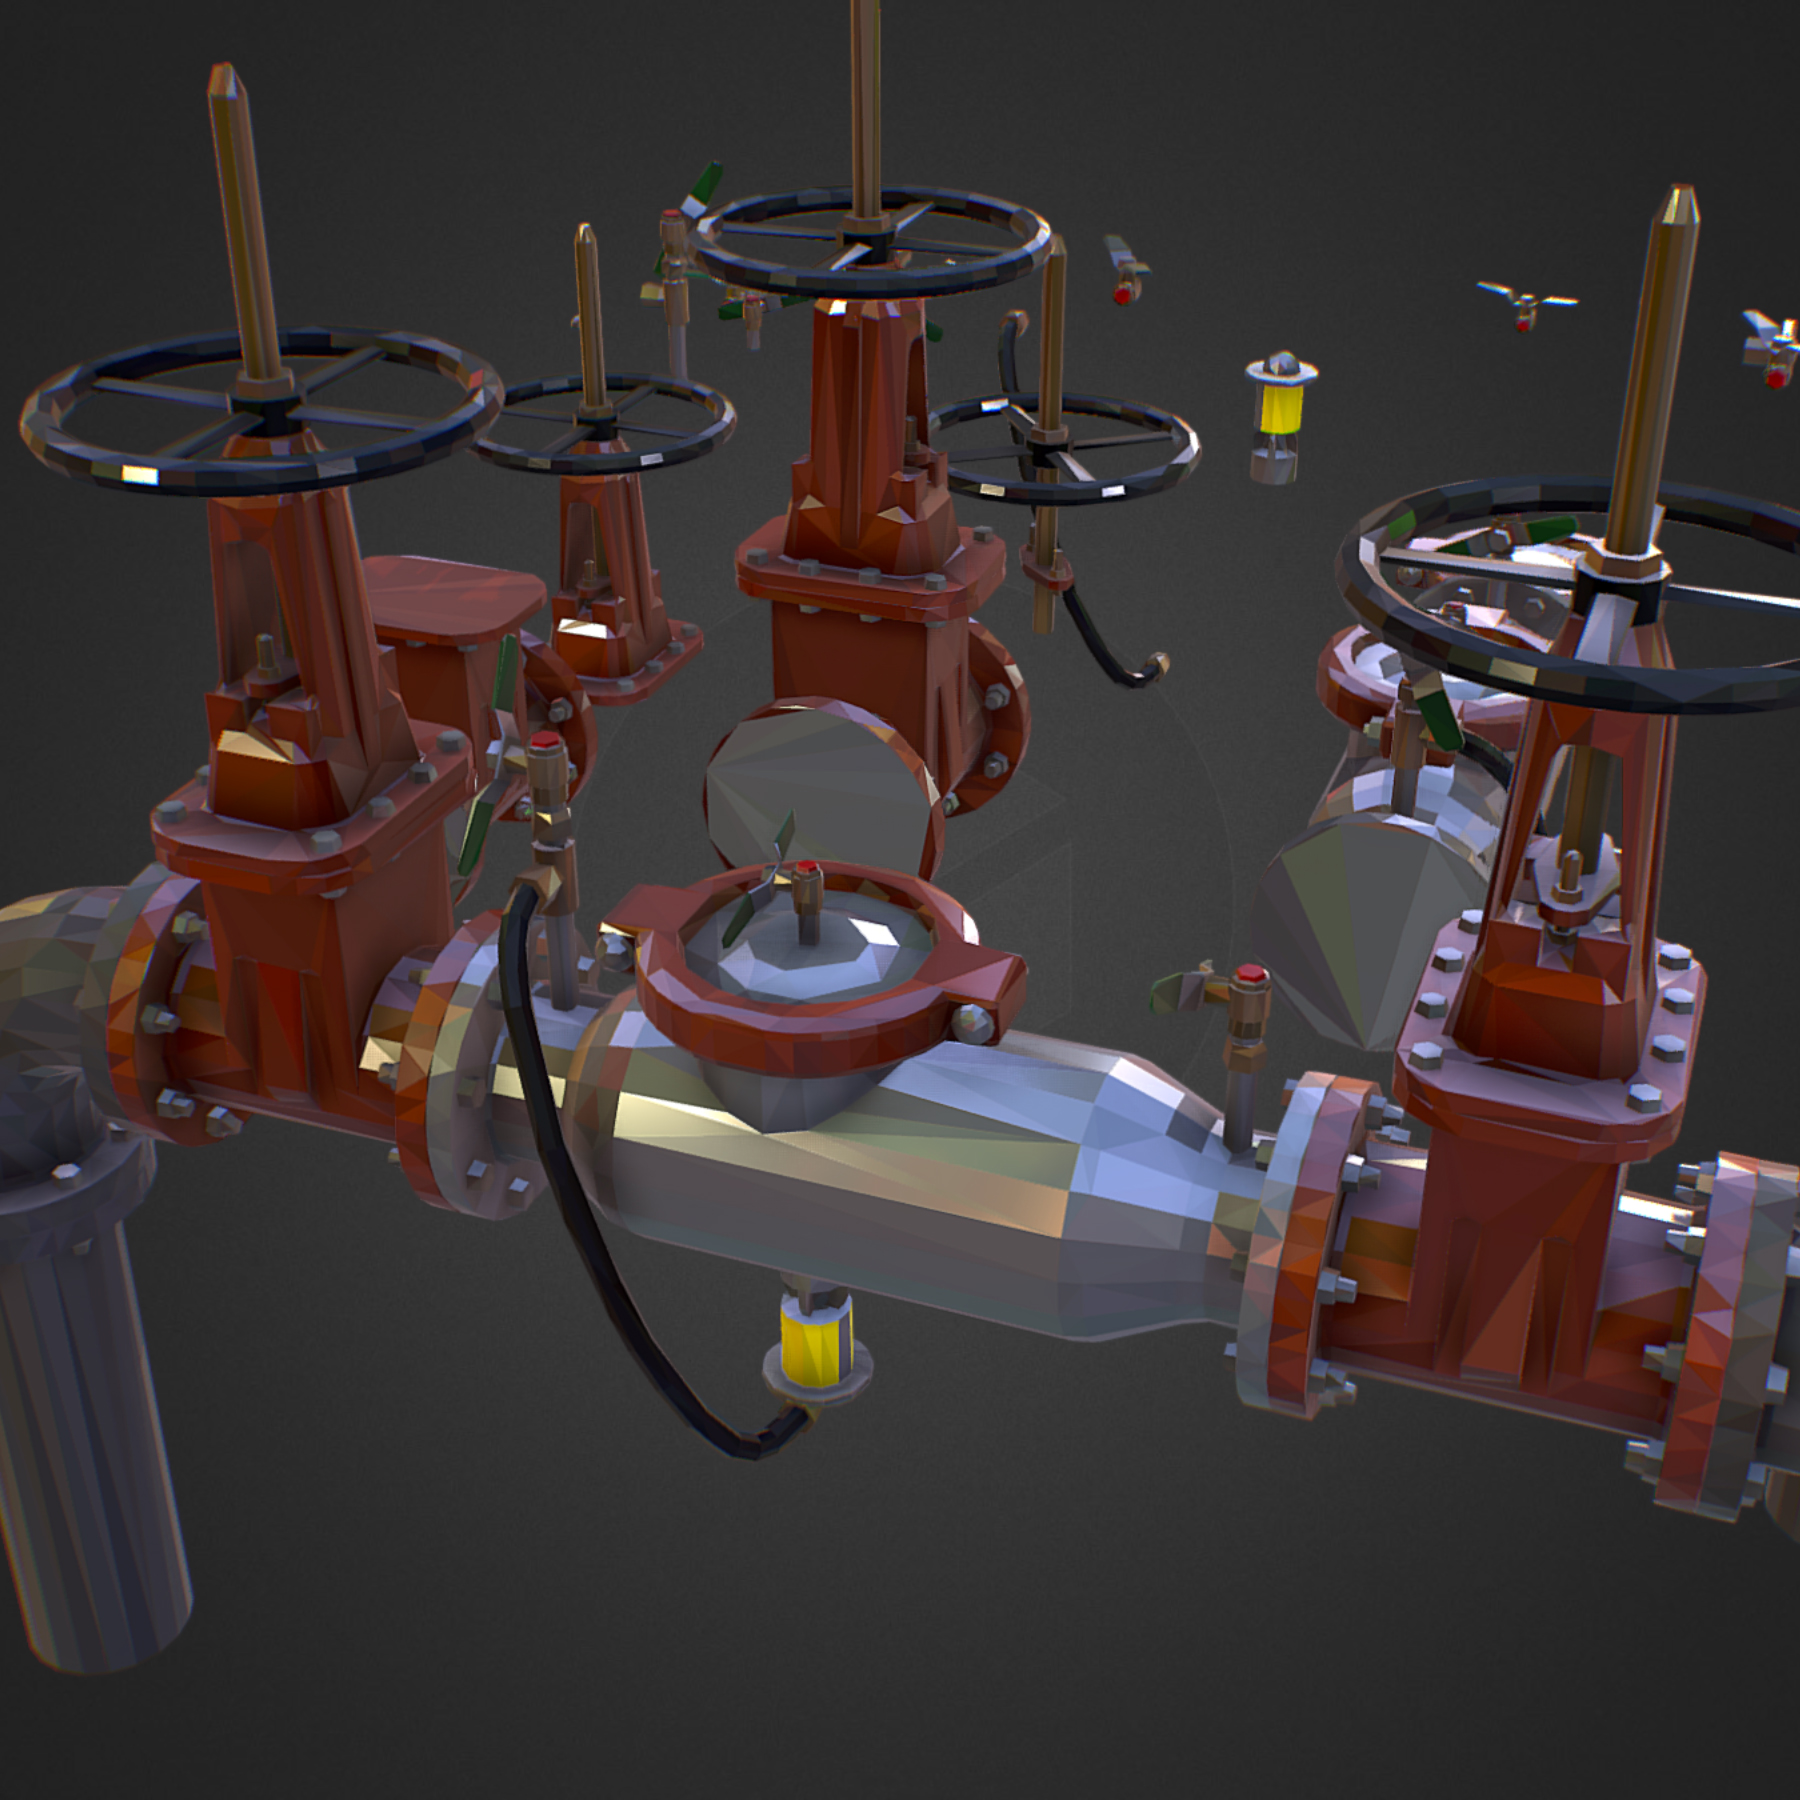 Low Poly ART Backflow Water Pipe Constructor 3d model max 3ds max plugin fbx ma mb tga targa icb vda vst pix obj 272538